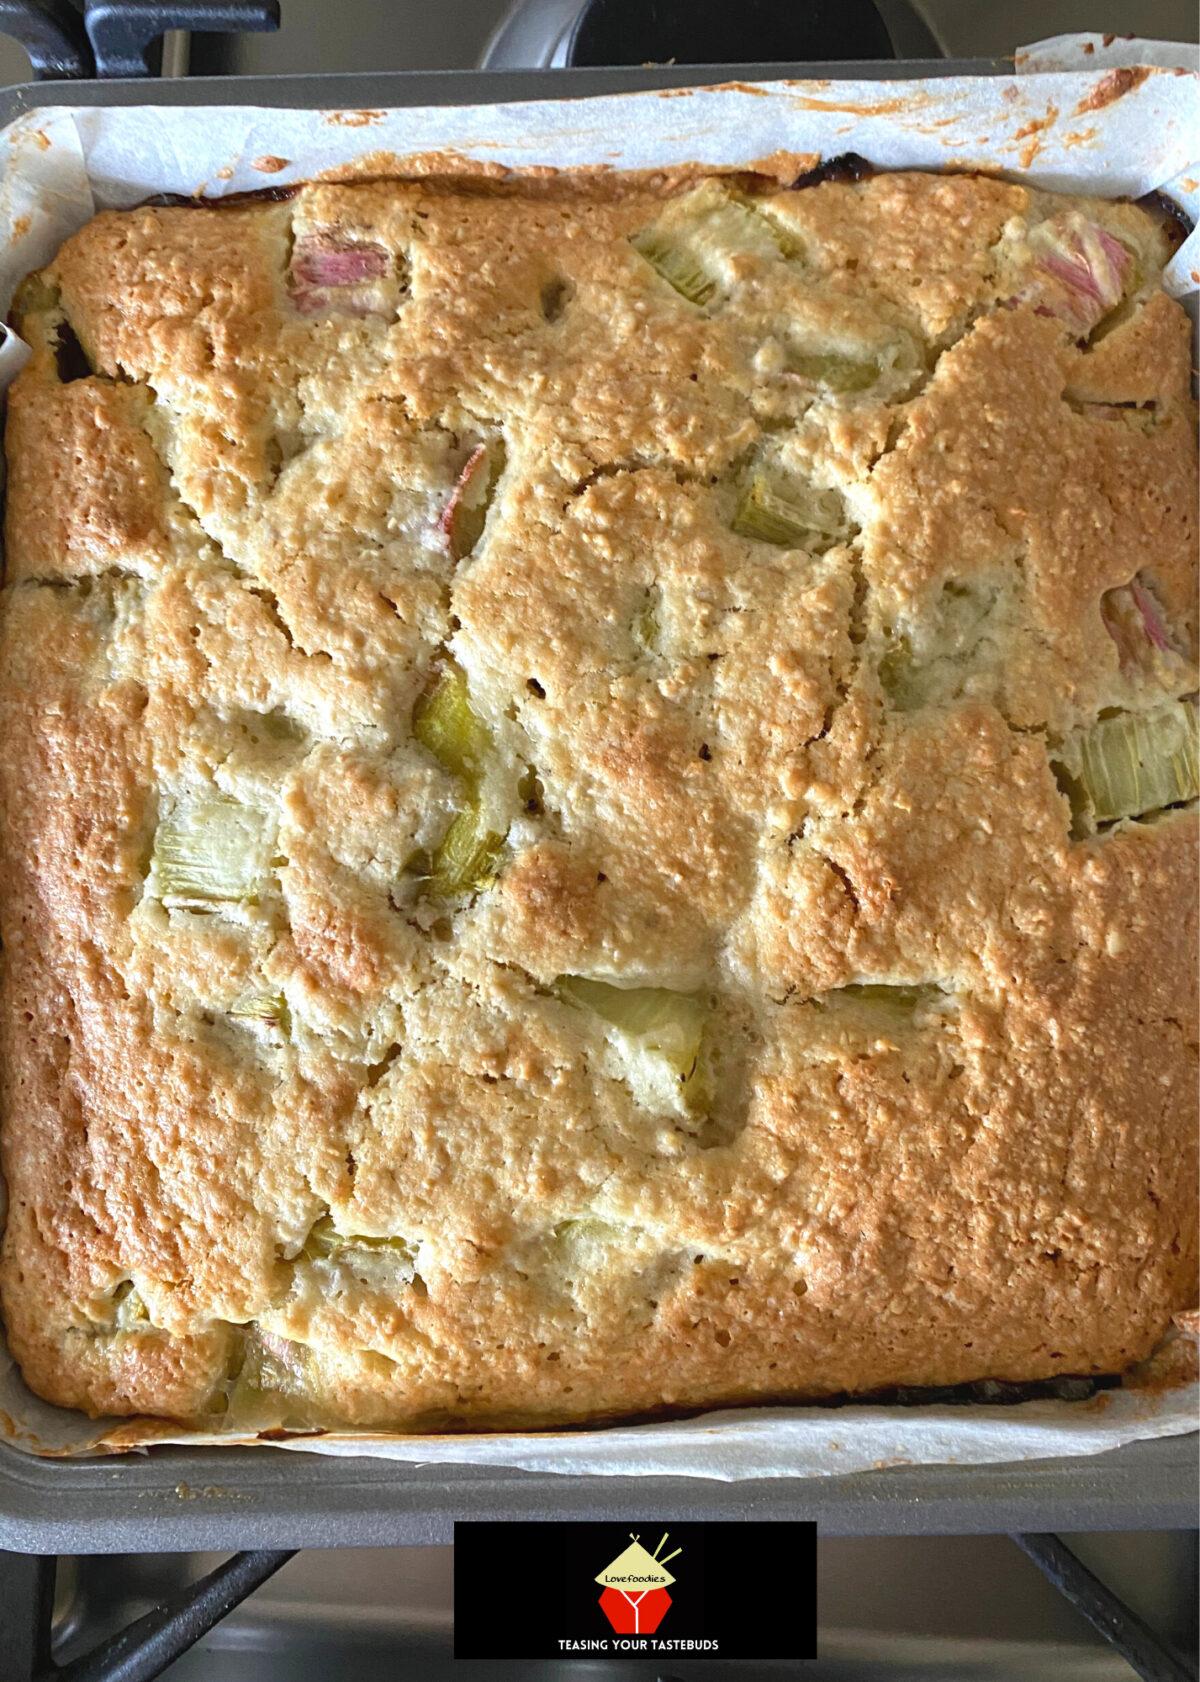 Lazy Daisy Rhubarb Oatmeal Cake, baked